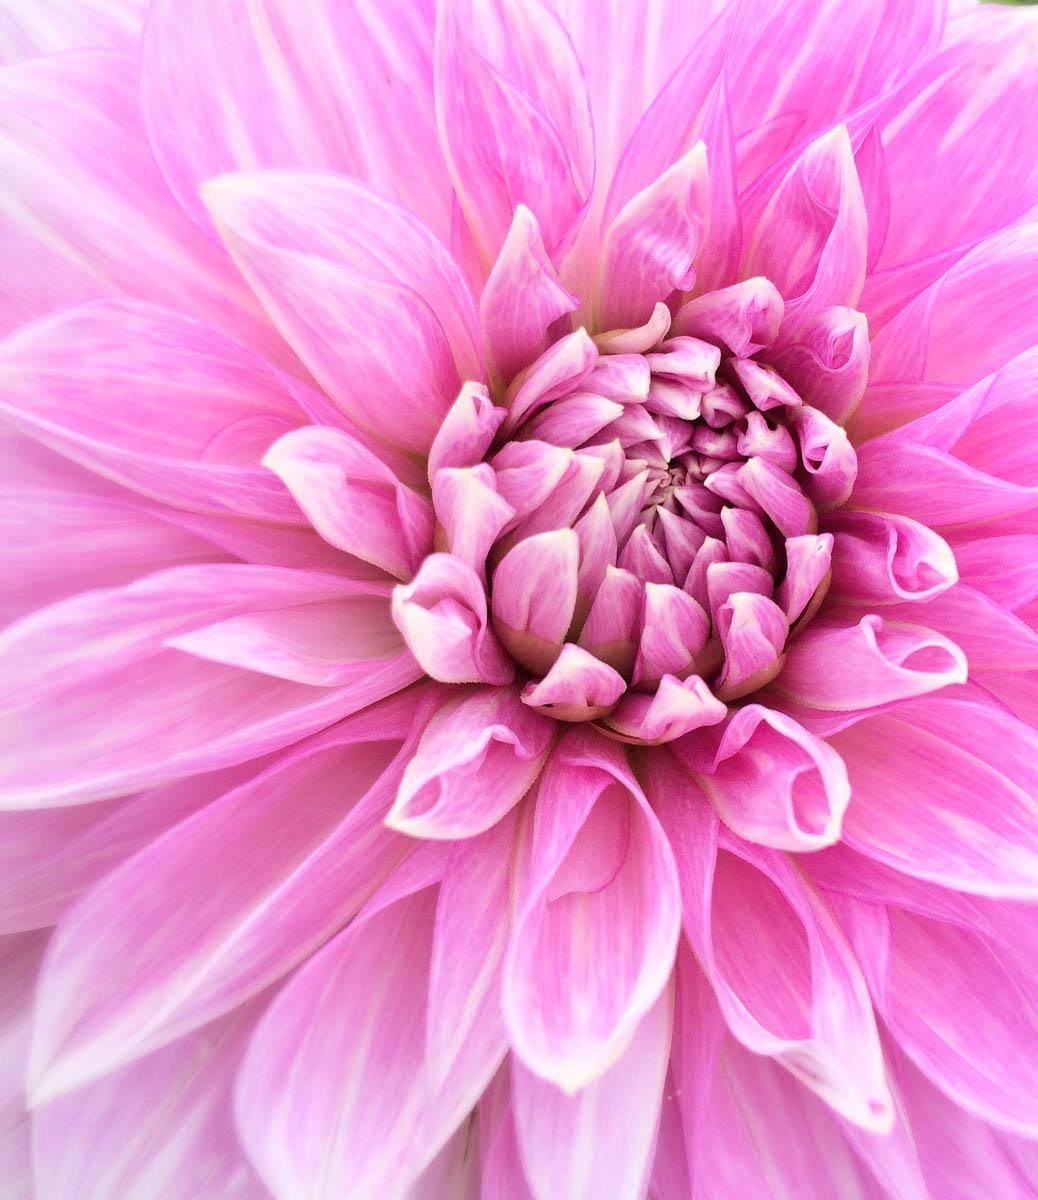 Brian_K_Powers_Photography_Nature_159.jpg